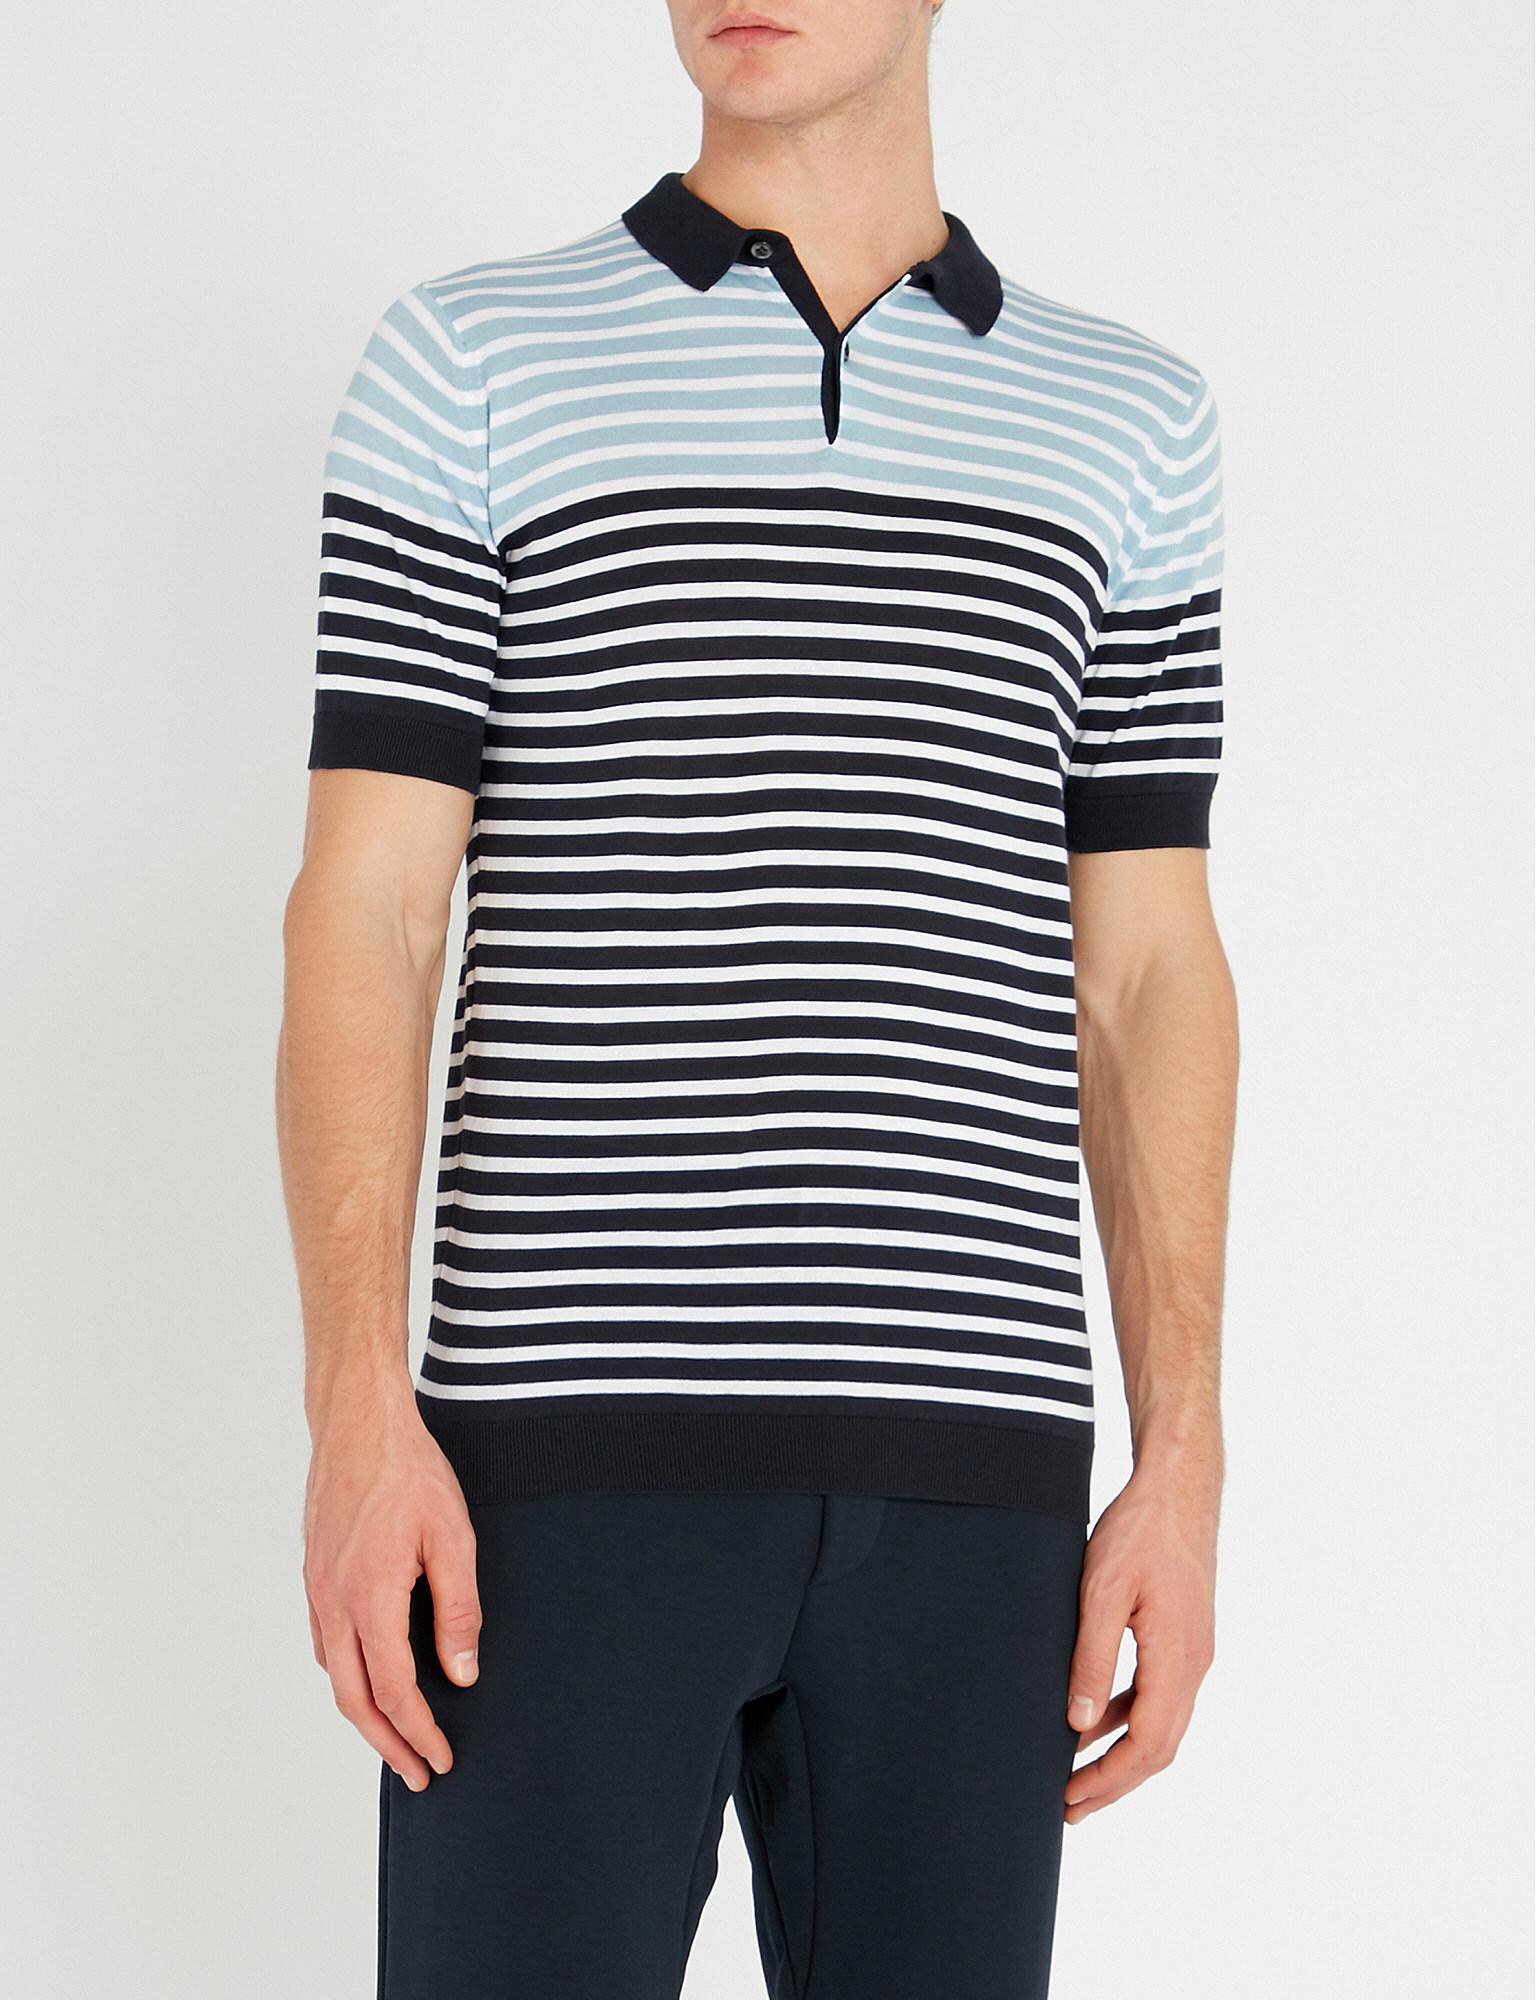 ac1902d15dbd Lyst - John Smedley Eddris Striped Cotton Polo Shirt in Blue for Men